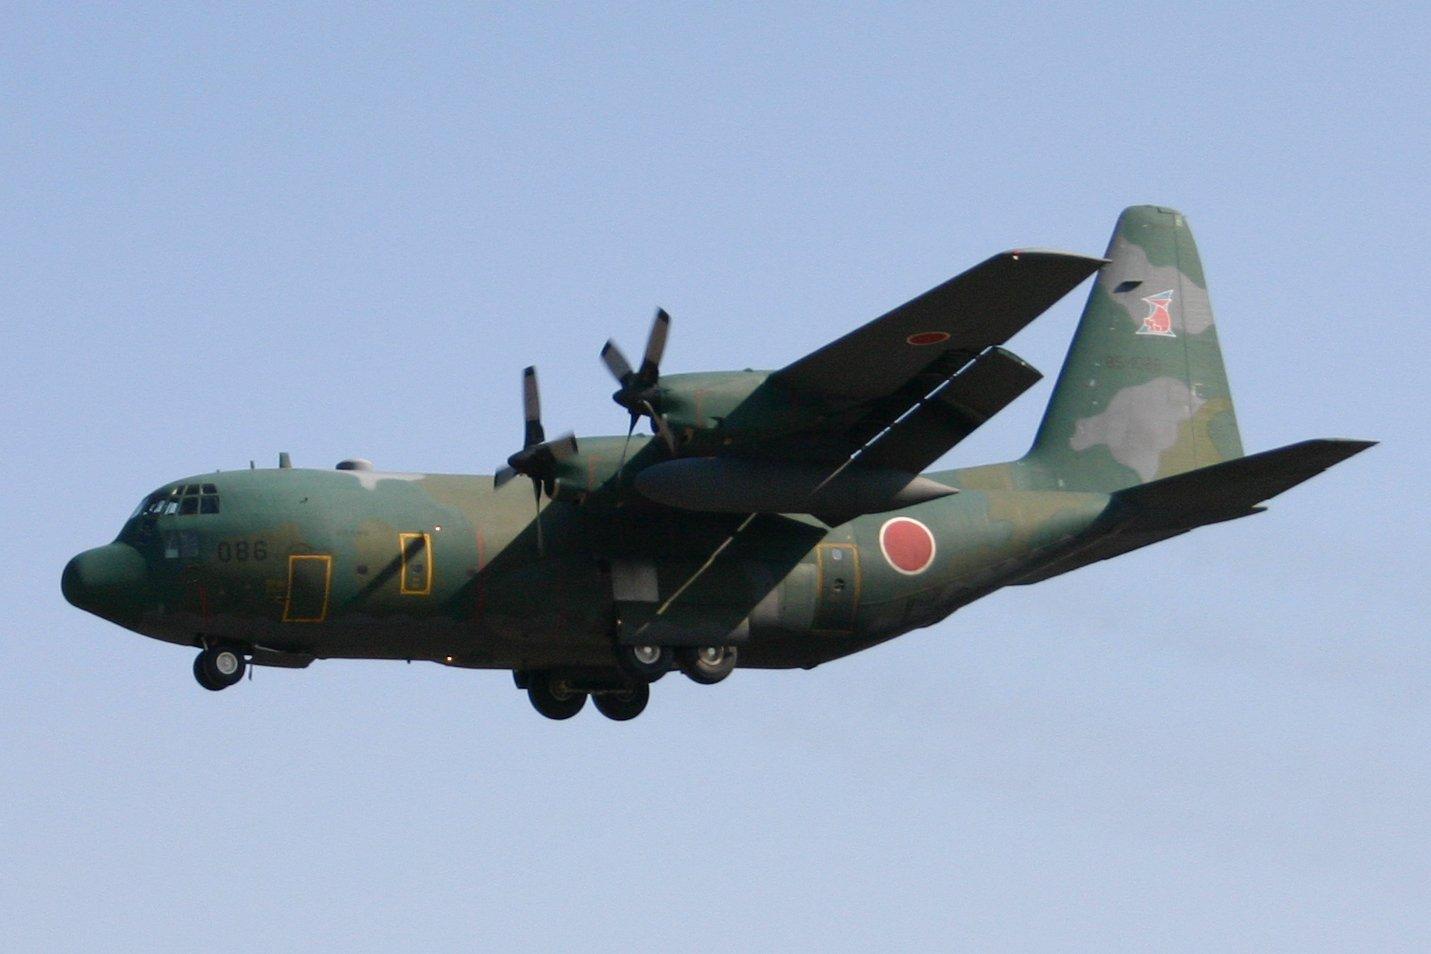 Elicottero C130 : C 輸送機 日本交通写真館